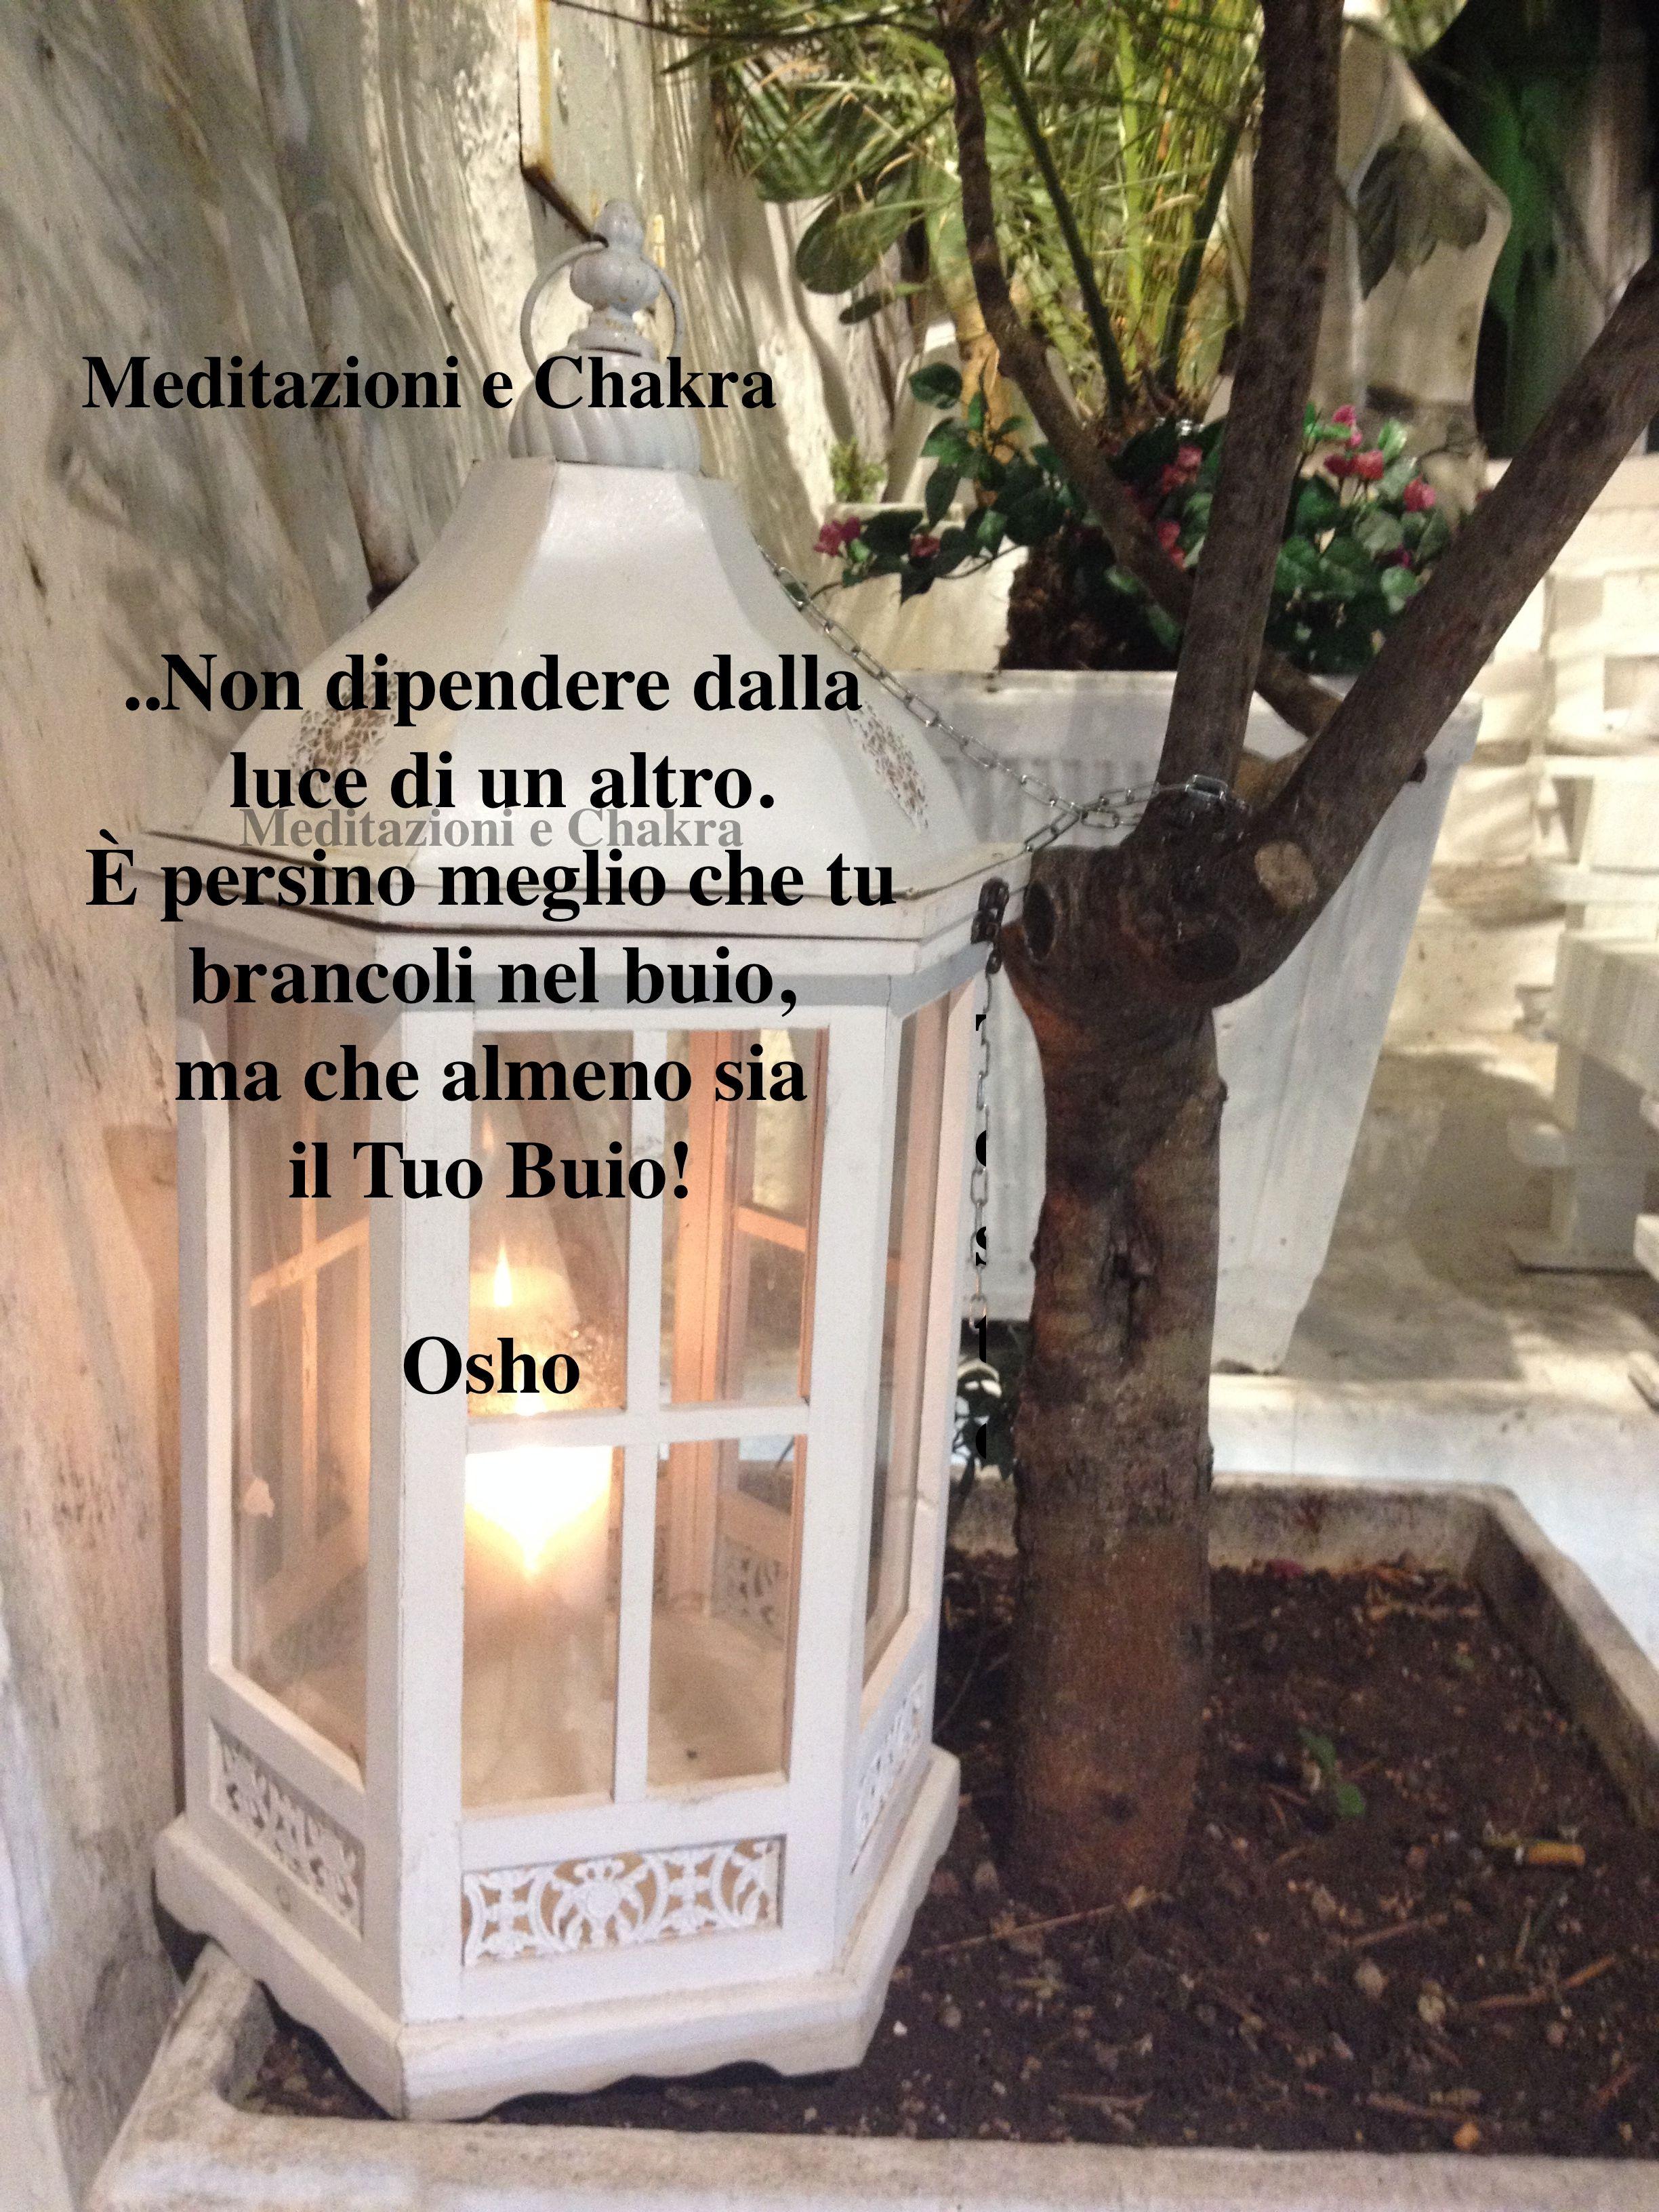 http://www.ilgiardinodeilibri.it/libri/__la-mia-vita-con-osho.php?pn=4319